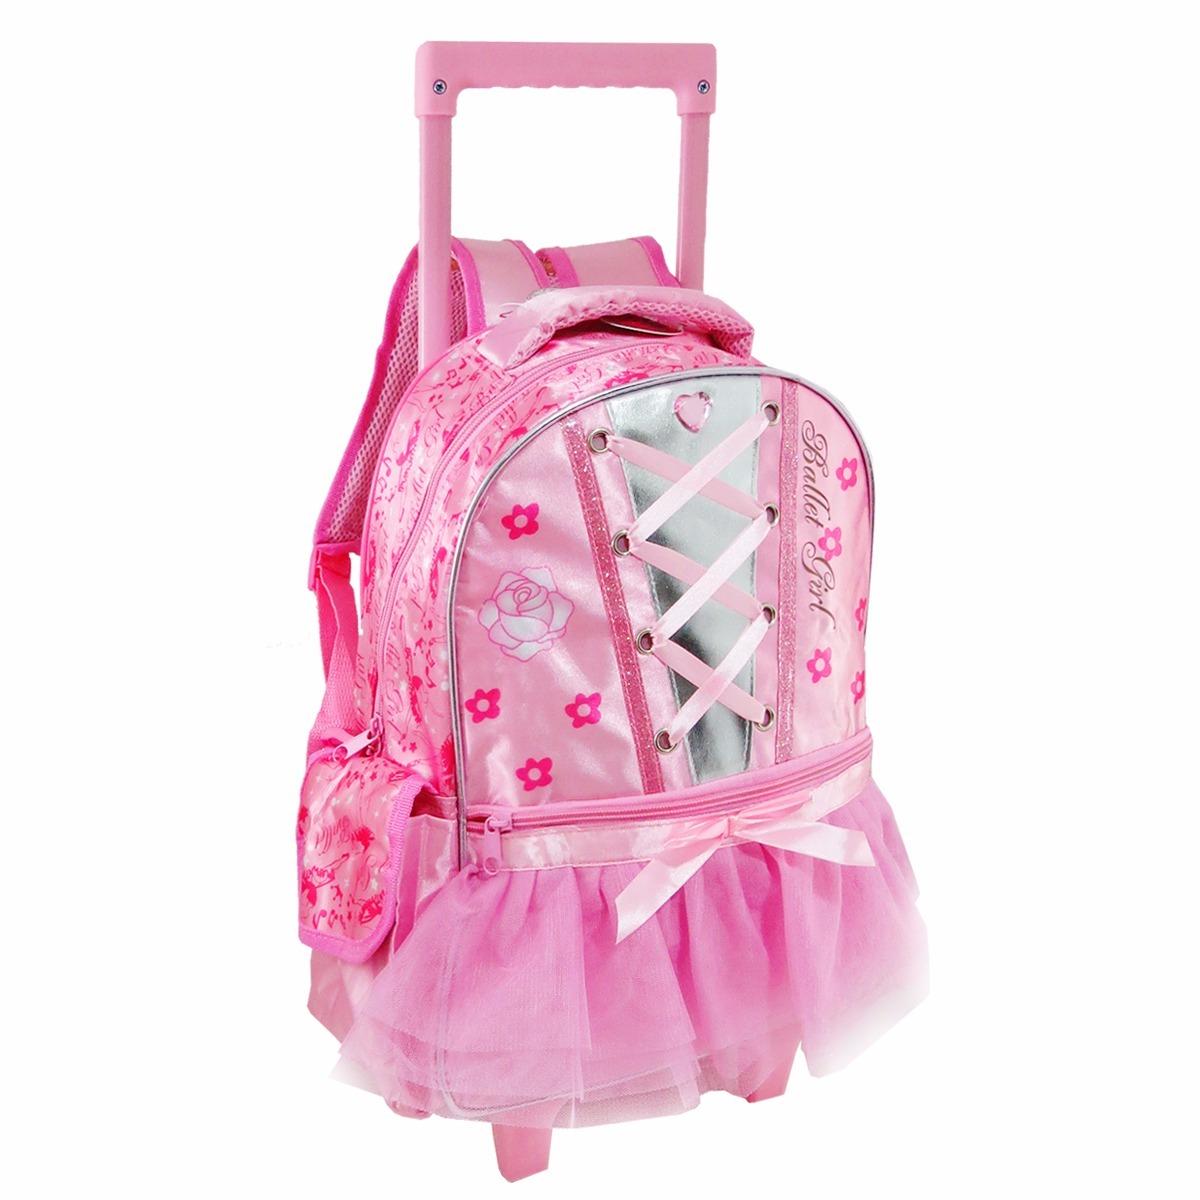 Bolsa Escolar Feminina Infantil : Mochila infantil feminina ballet com rodinhas r